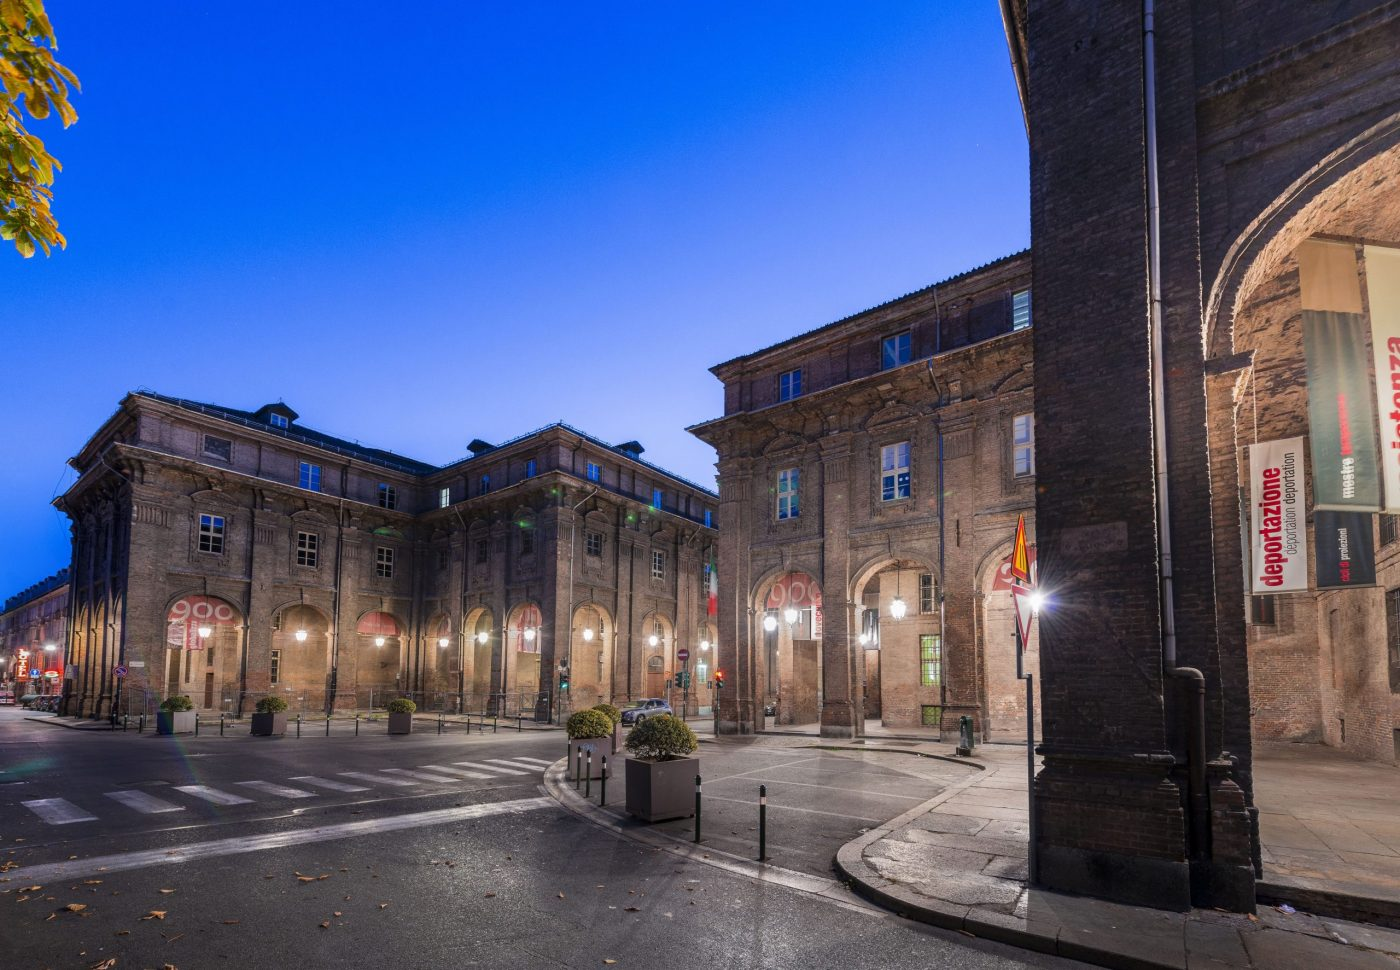 Una notte con Biennale Democrazia / Music & drink